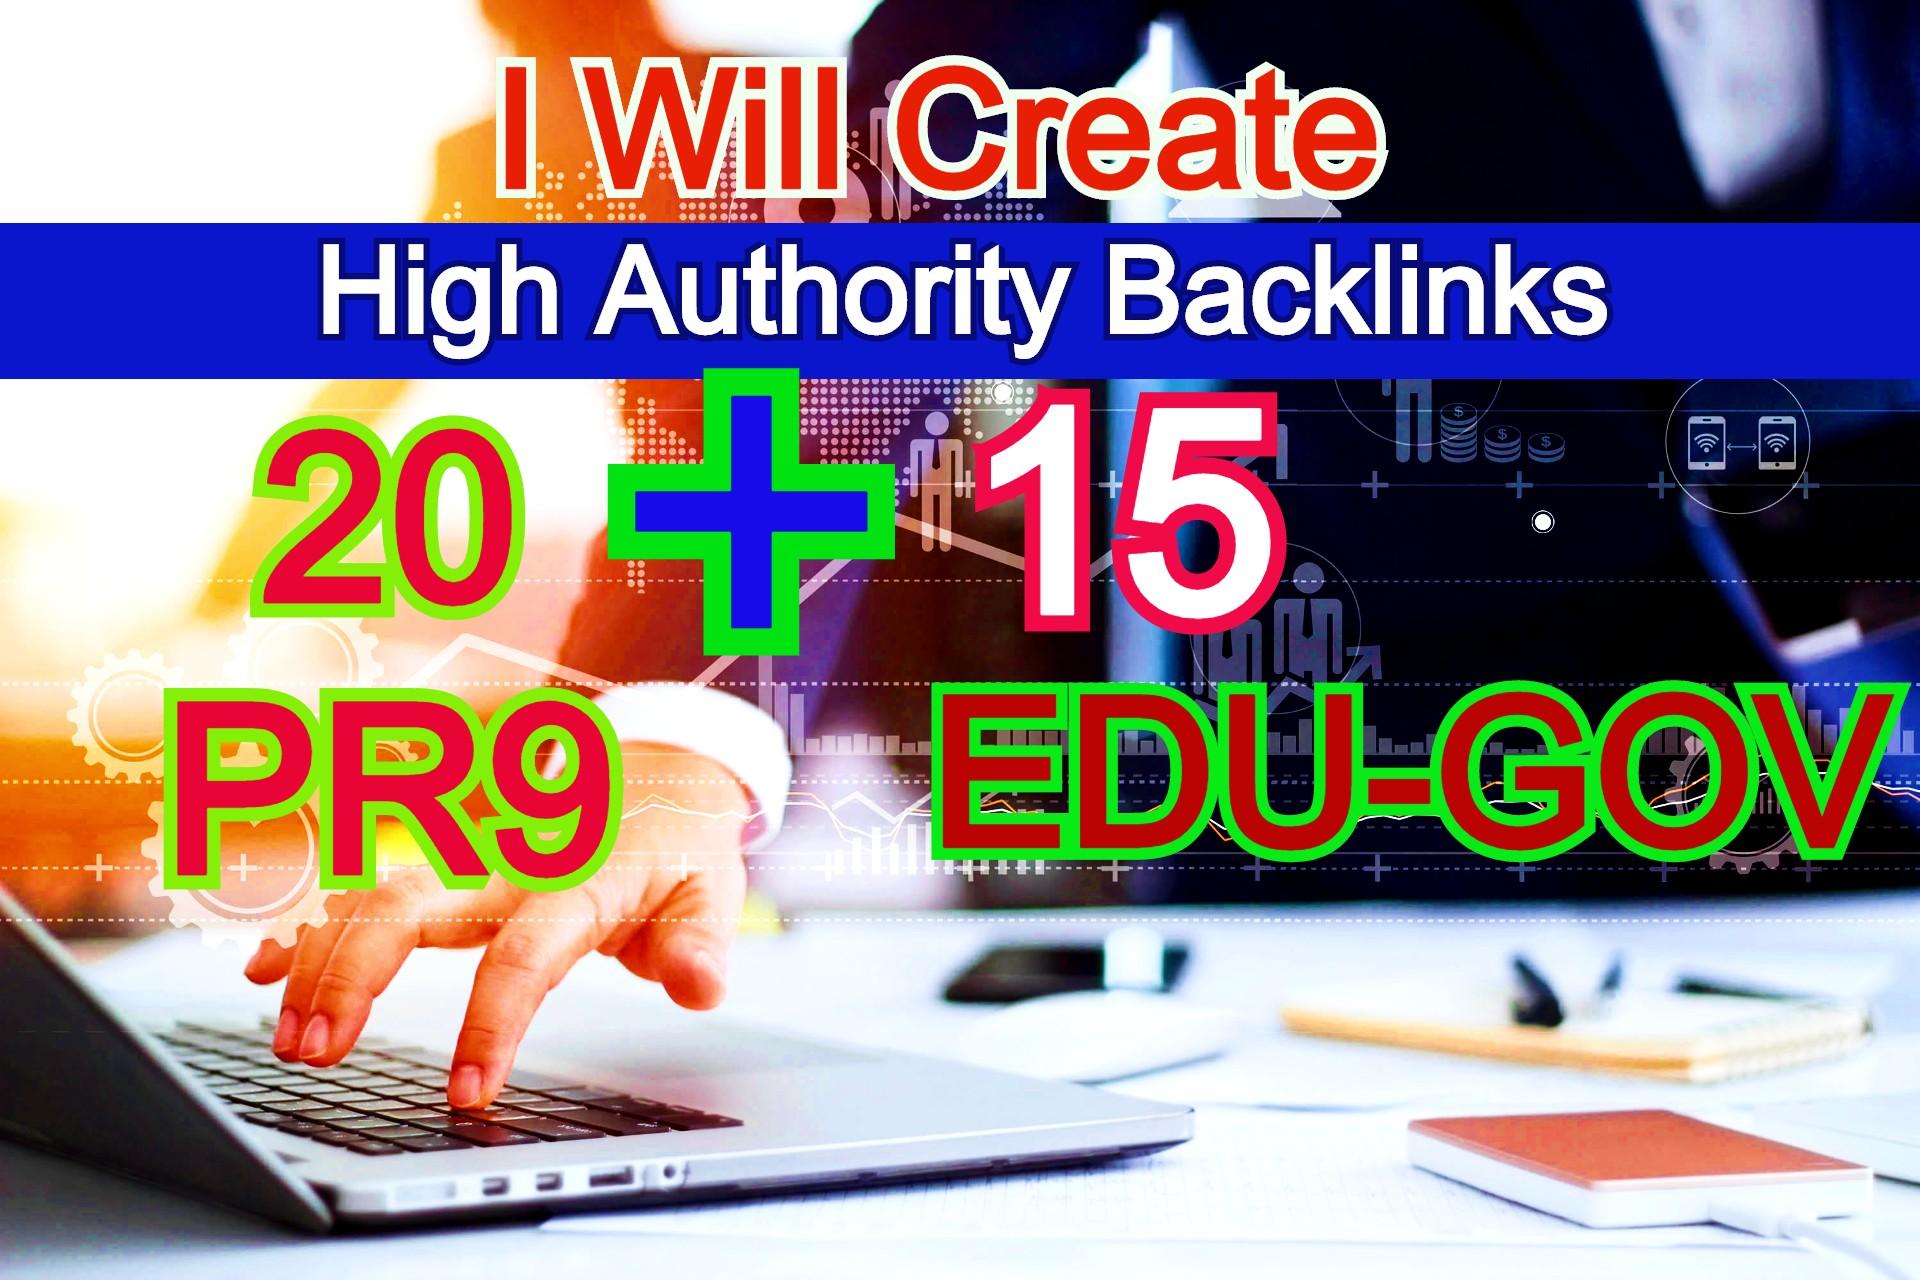 I Will Create High Authority Backlinks 20 PR9 And 15 EDU-Gov Profile Links